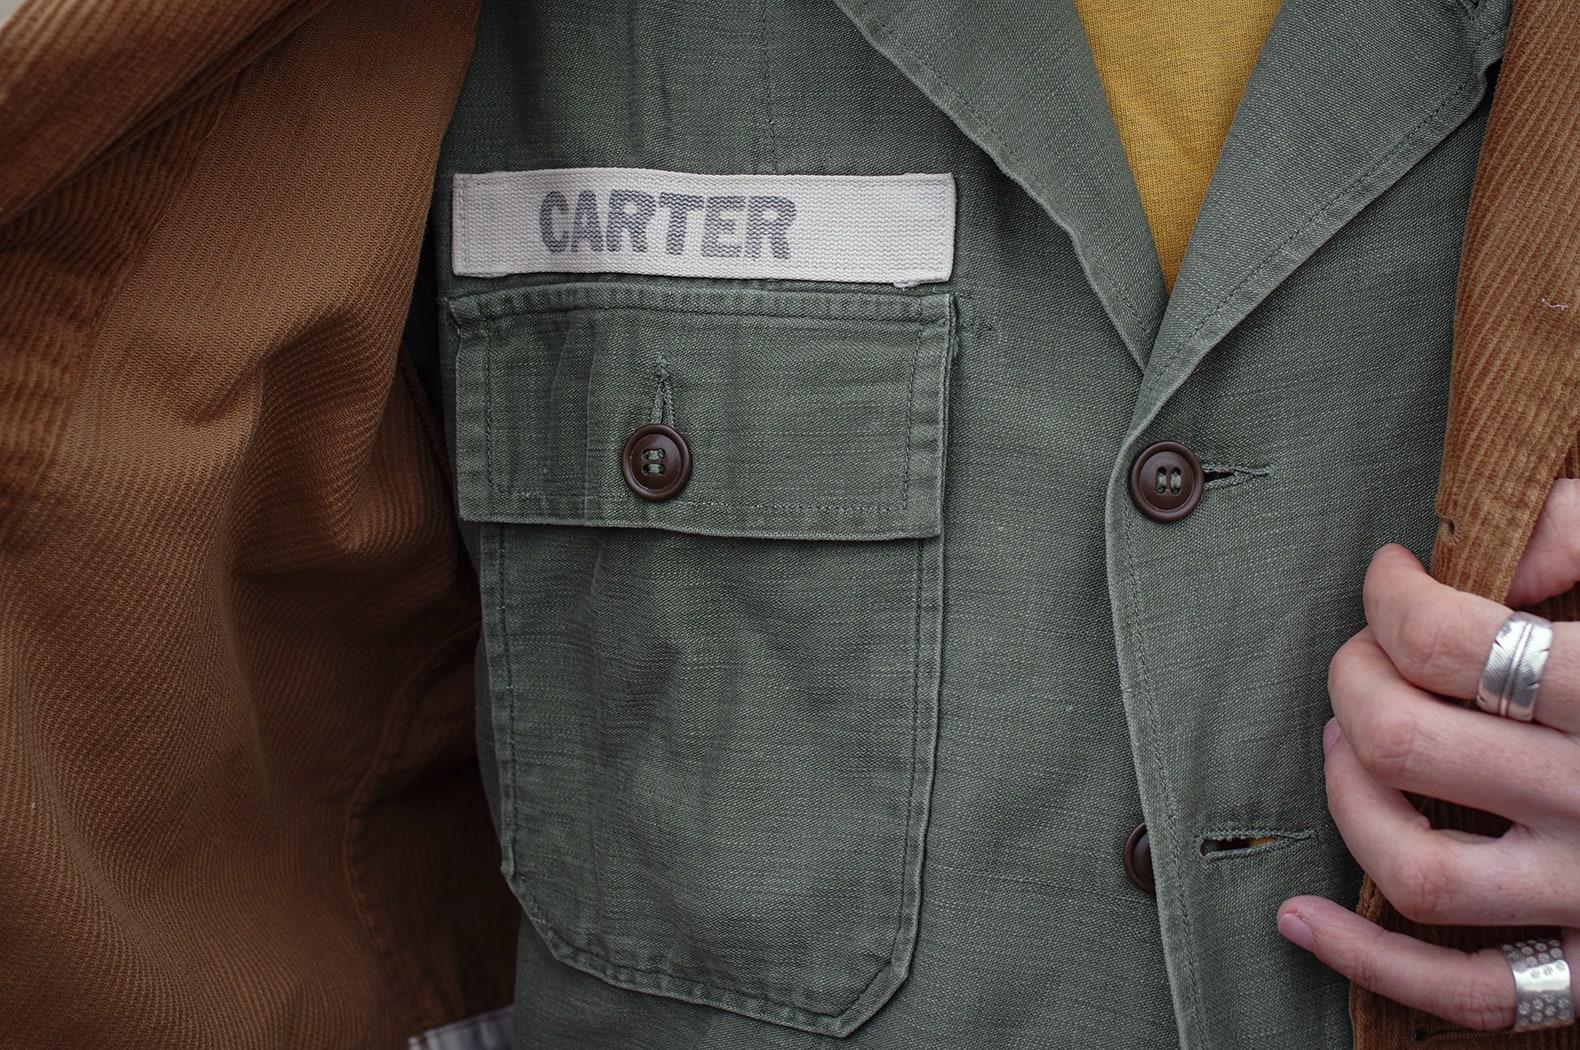 US army cotton sateen OG 107 type 1 shirt